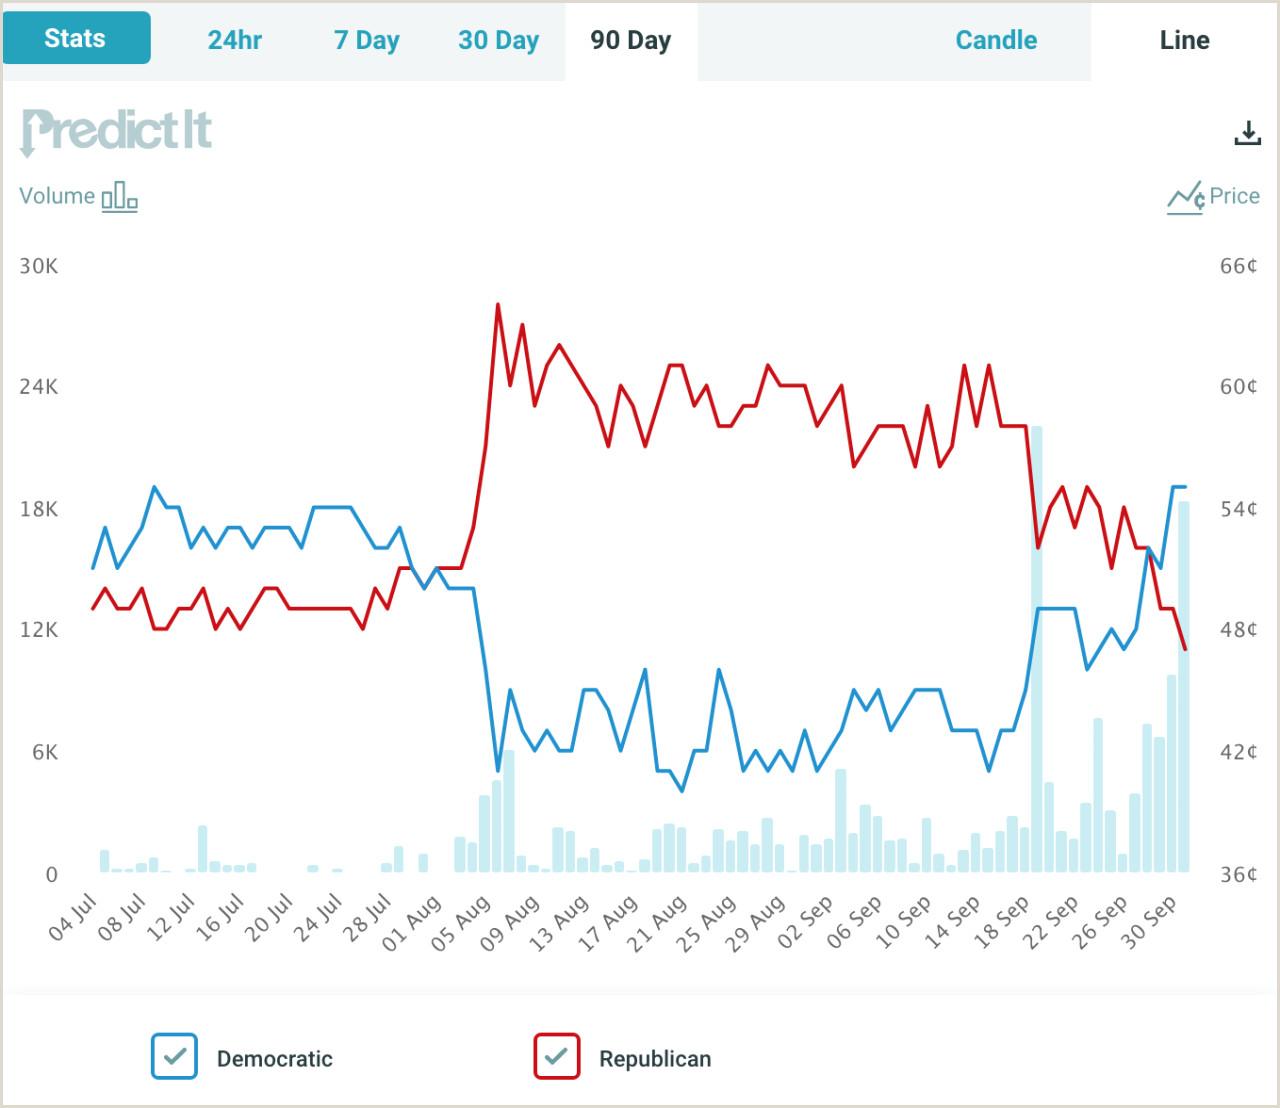 Best Business Cards No Forex Reddit Predictit Political Analysis